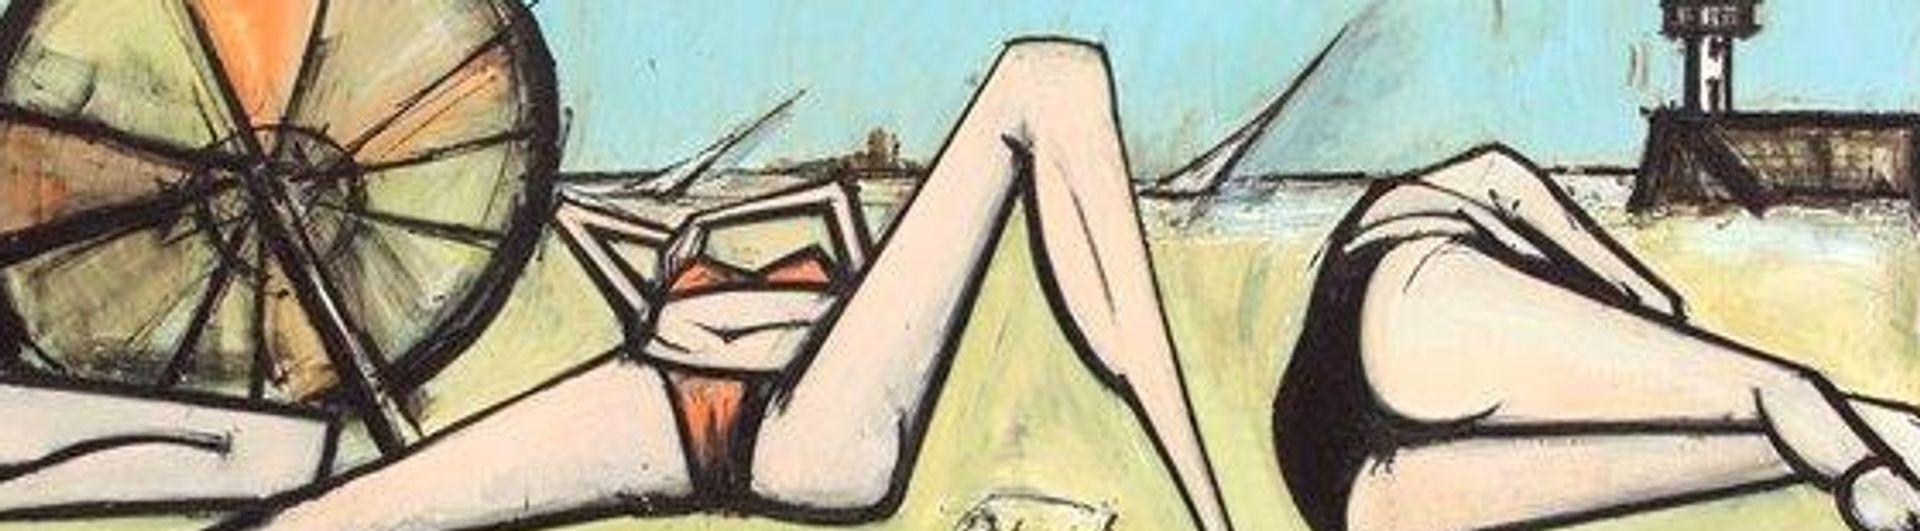 Bernard Buffet's Les plages, la grande plage (1967). Galerie Tamenaga